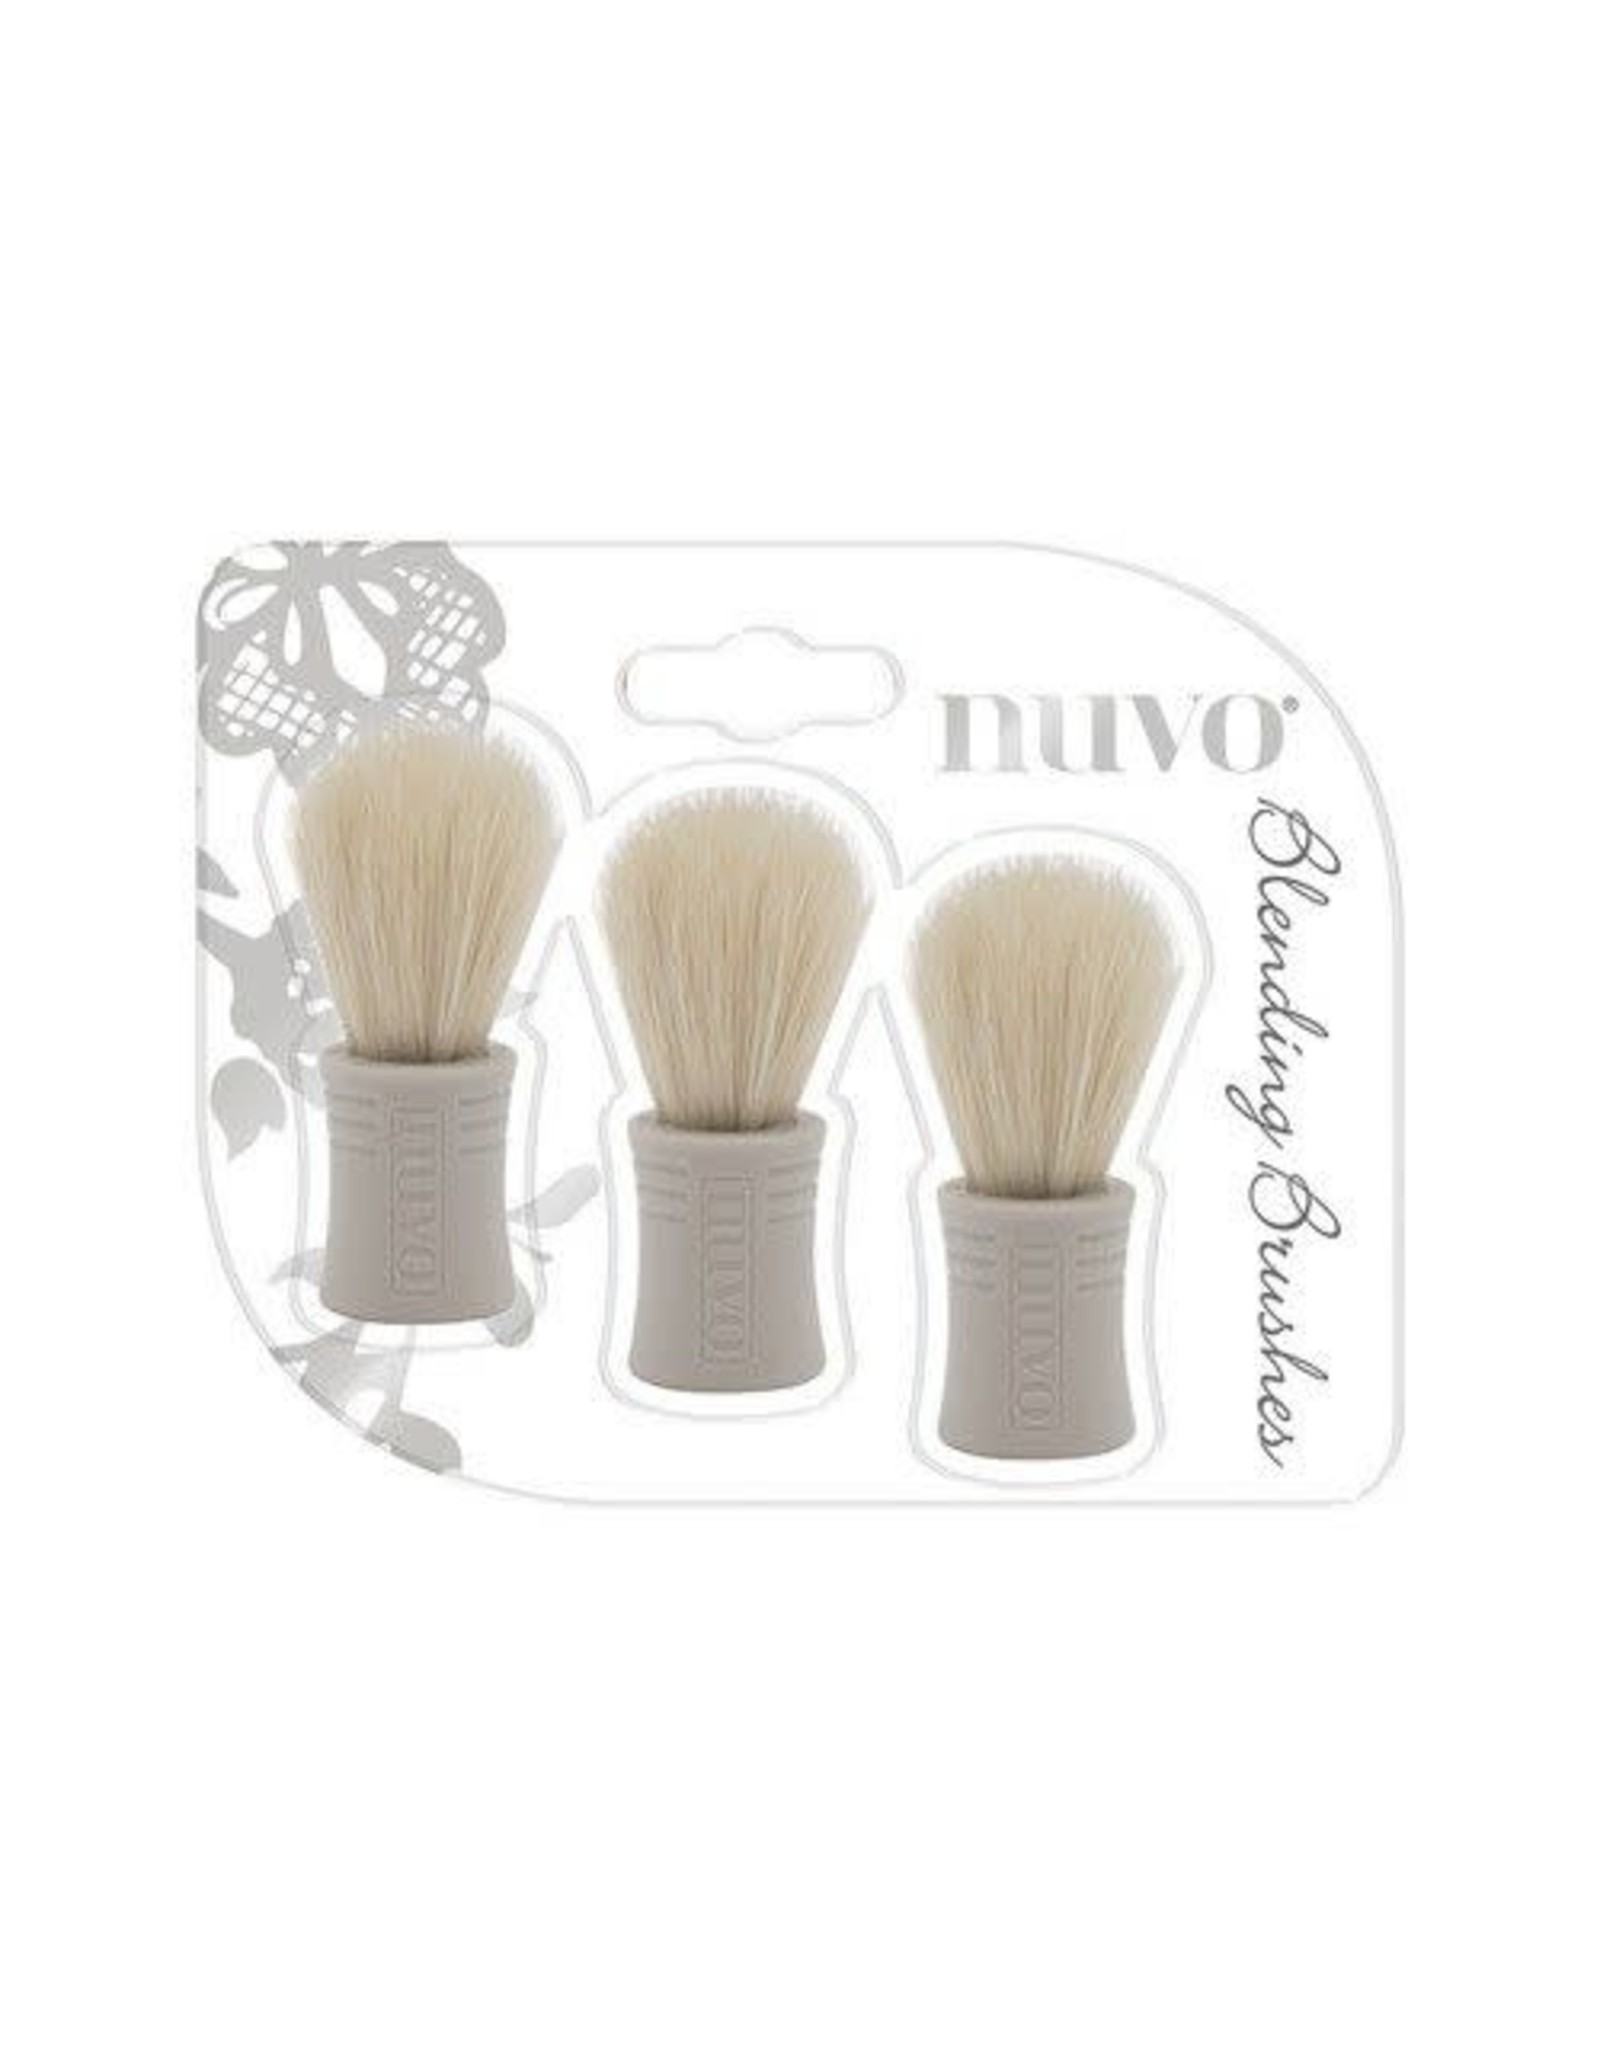 Nuvo by tonic Nuvo Blending brushes - borstels 3 stuks 970N